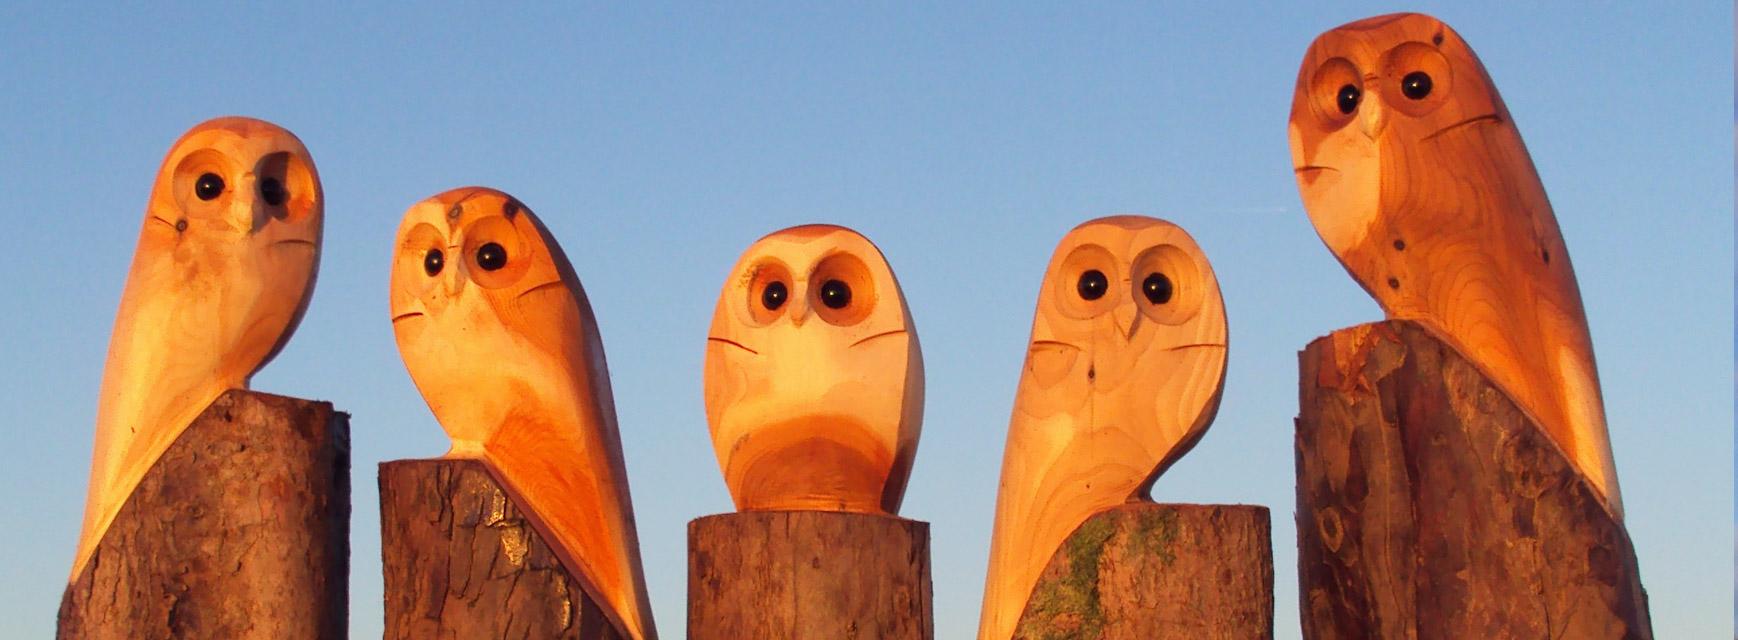 Duncan Kitson Owl Wooden Sculptures